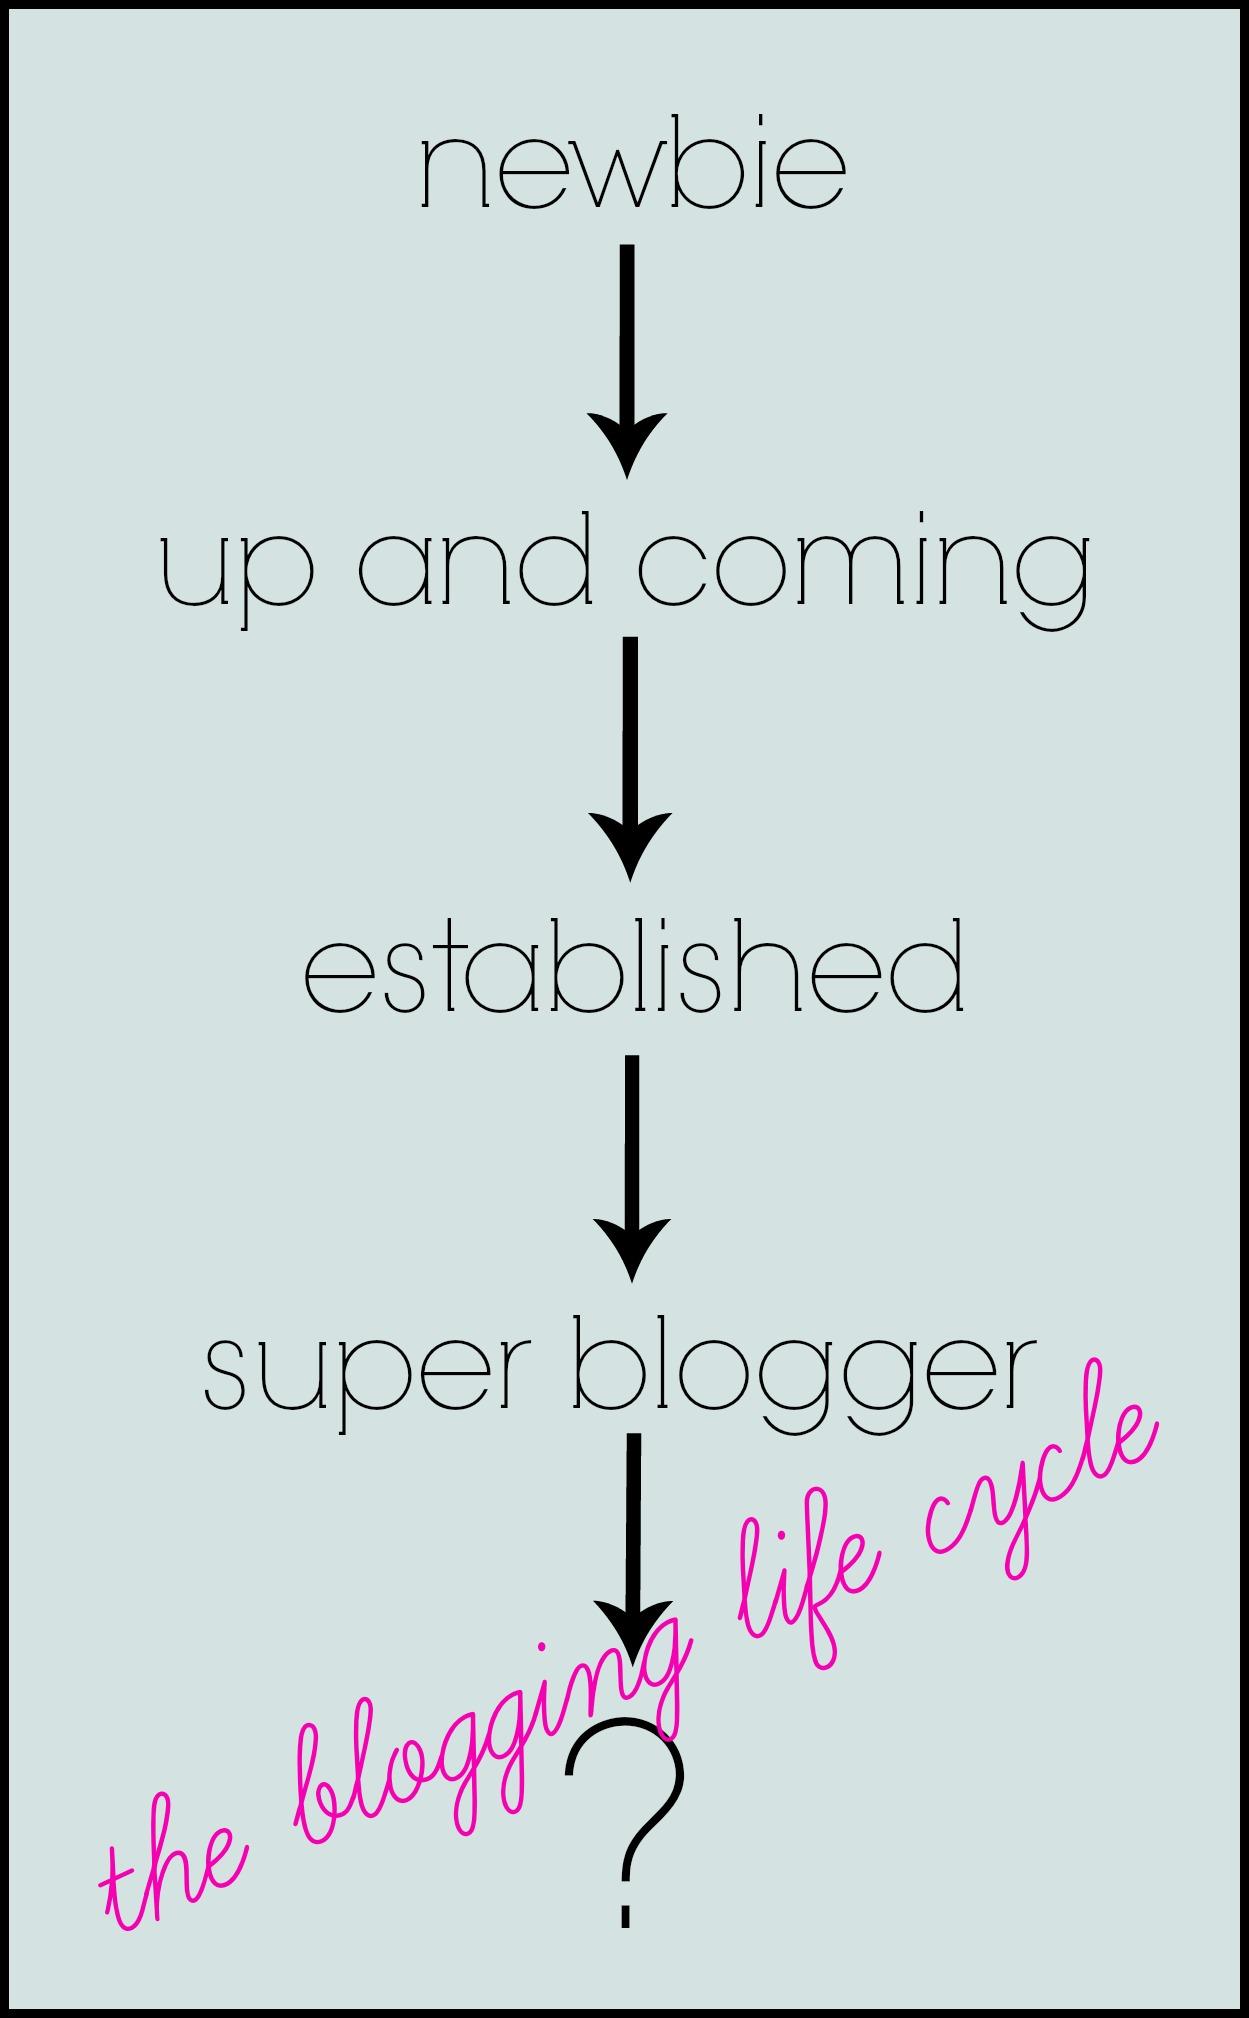 Are you a newbie or a superblogger